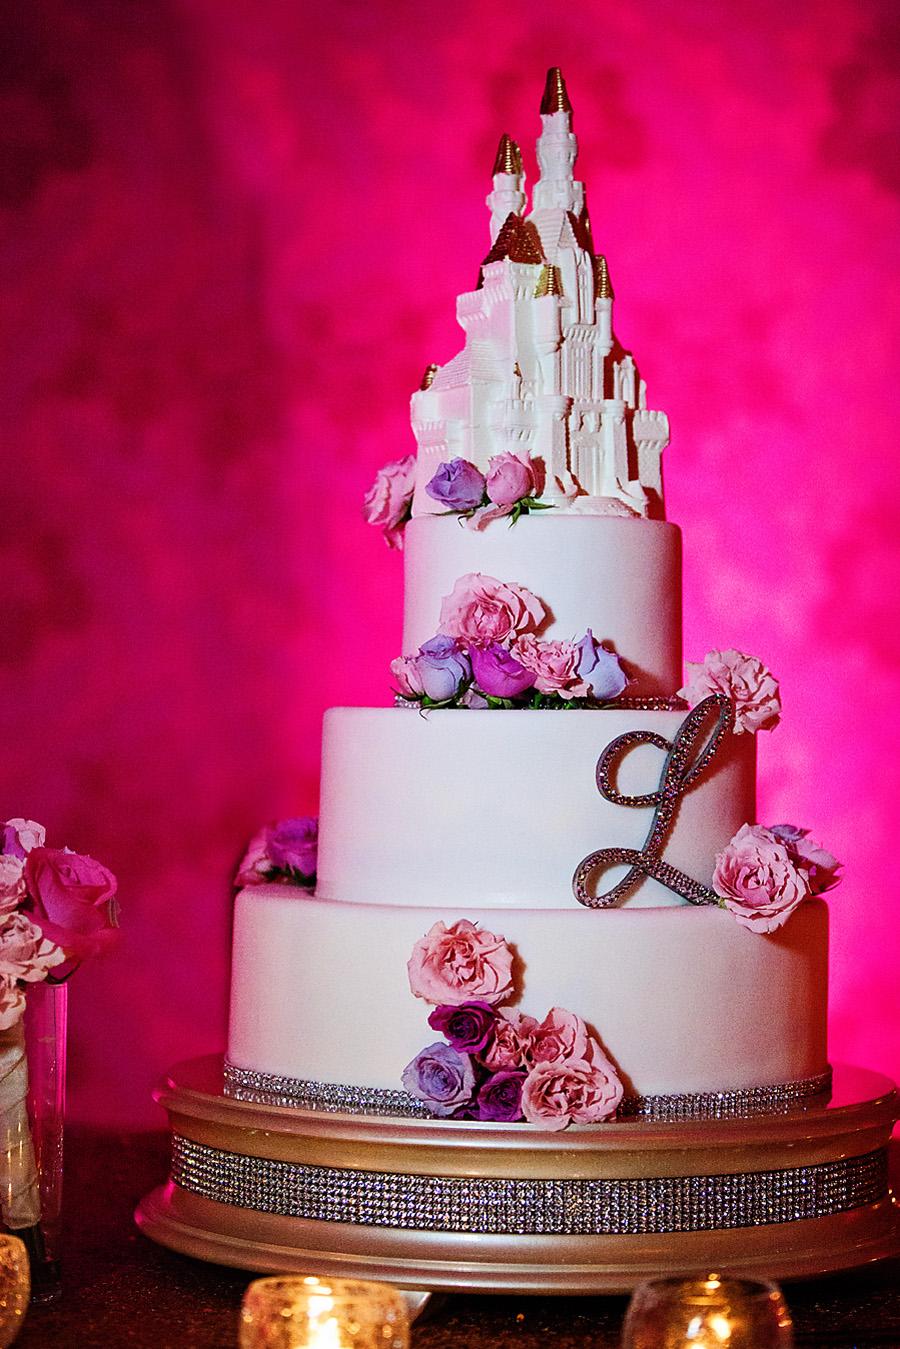 White Rabbit Photo Boutique, Disneyland Wedding, A Good Affair Wedding and Event Design